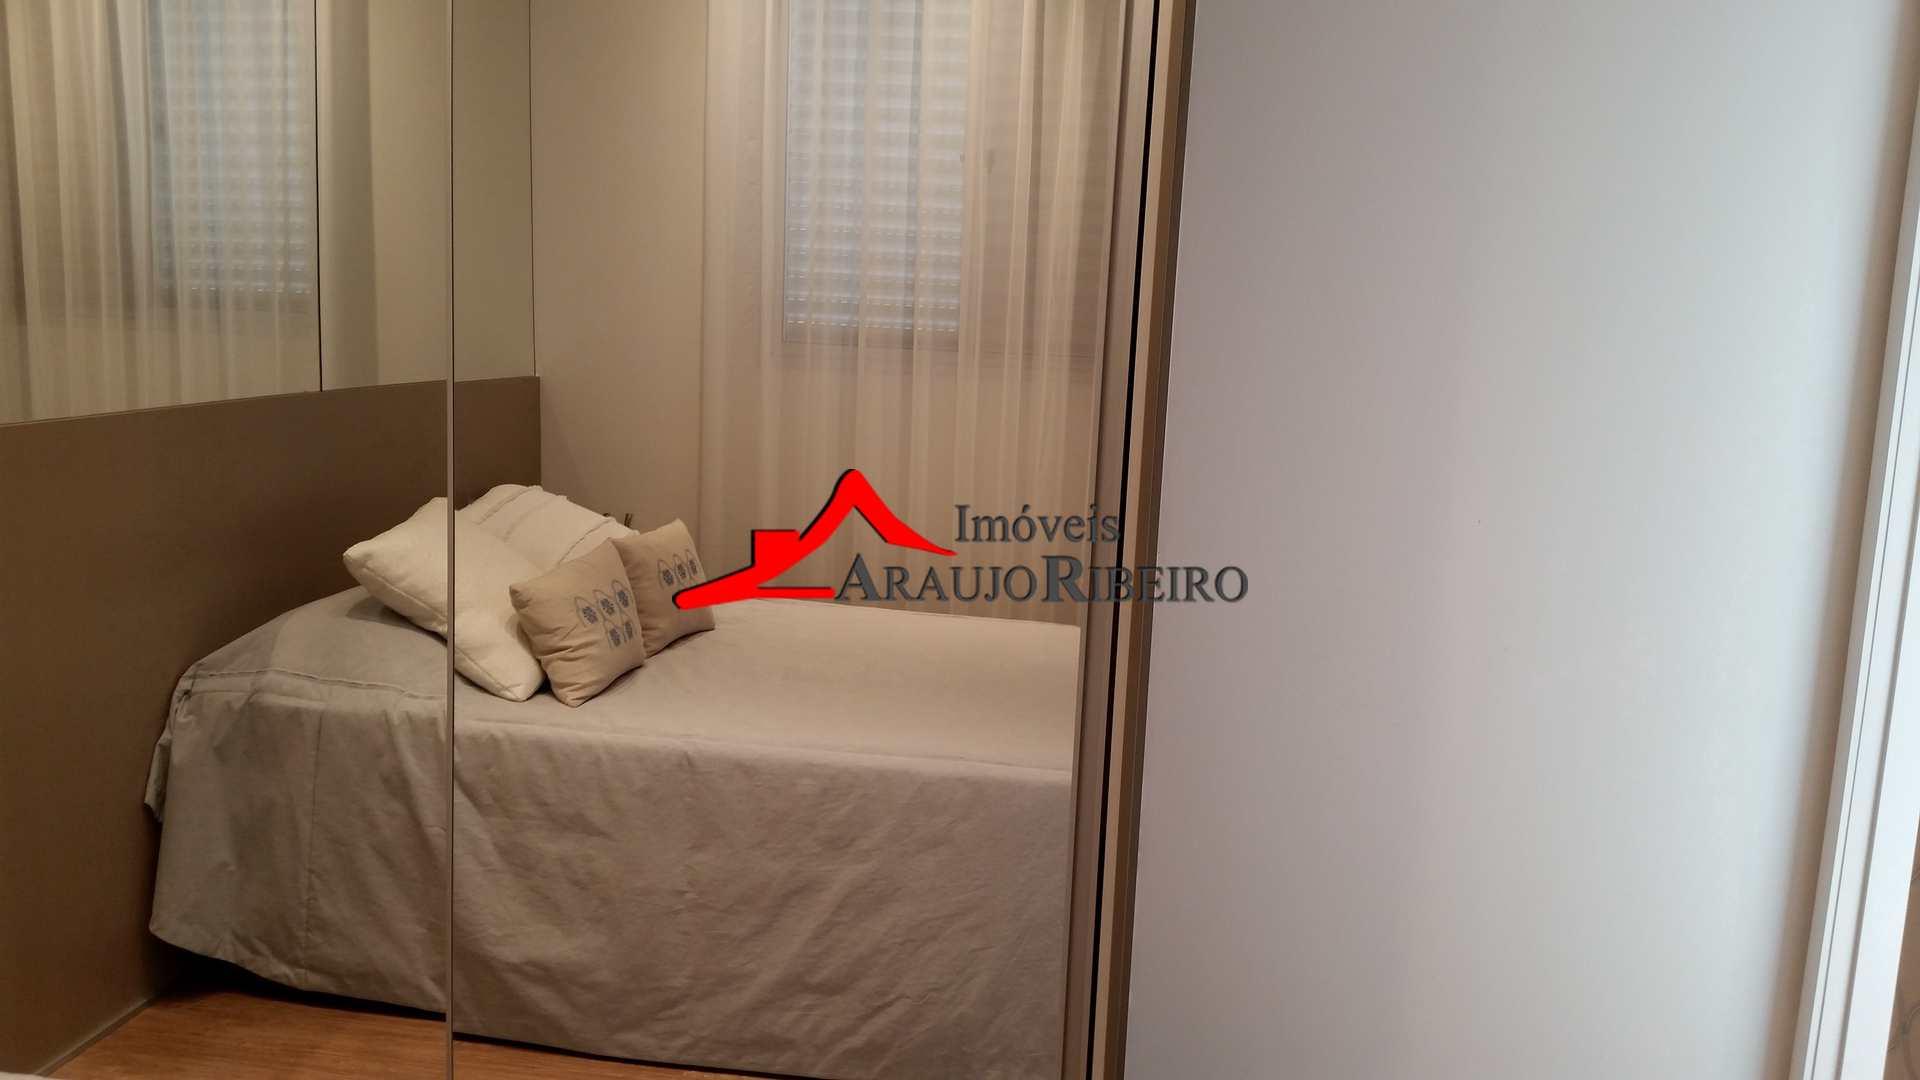 Apartamento com 2 dorms, Jardim Jaraguá, Taubaté - R$ 151 mil, Cod: 3193